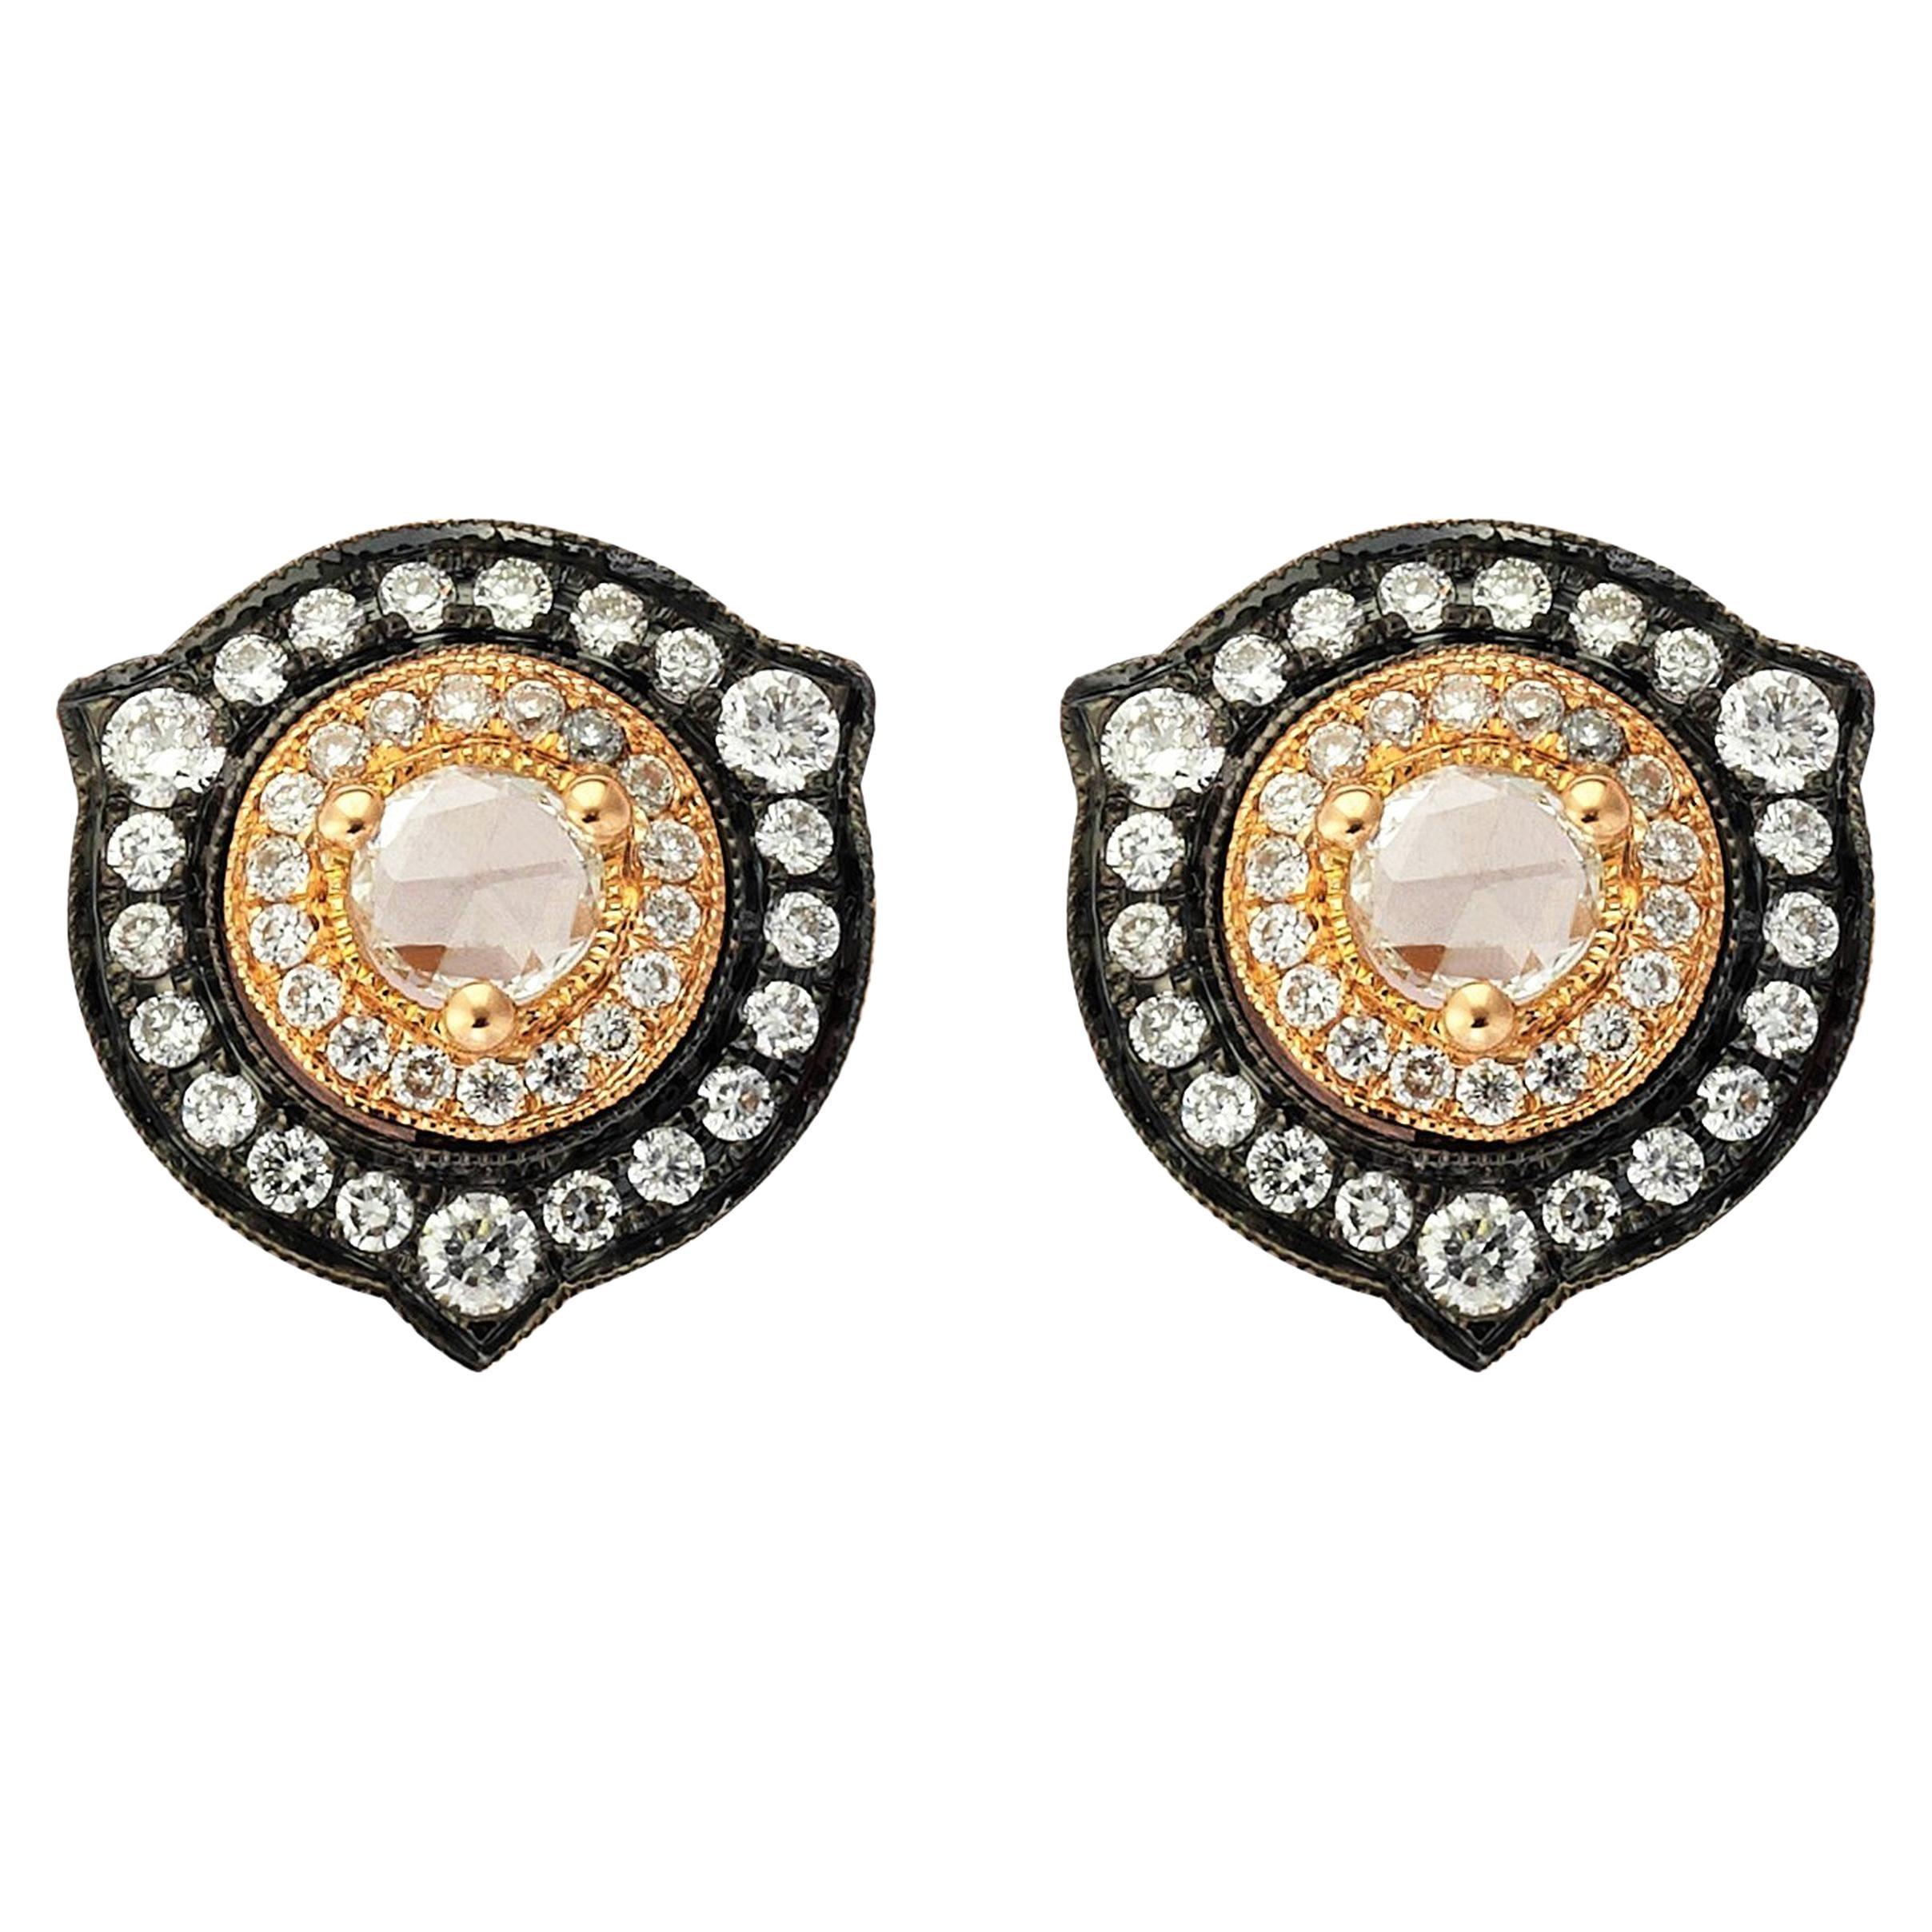 18 Karat Gold Monan 0.59 Carat Diamond Earrings